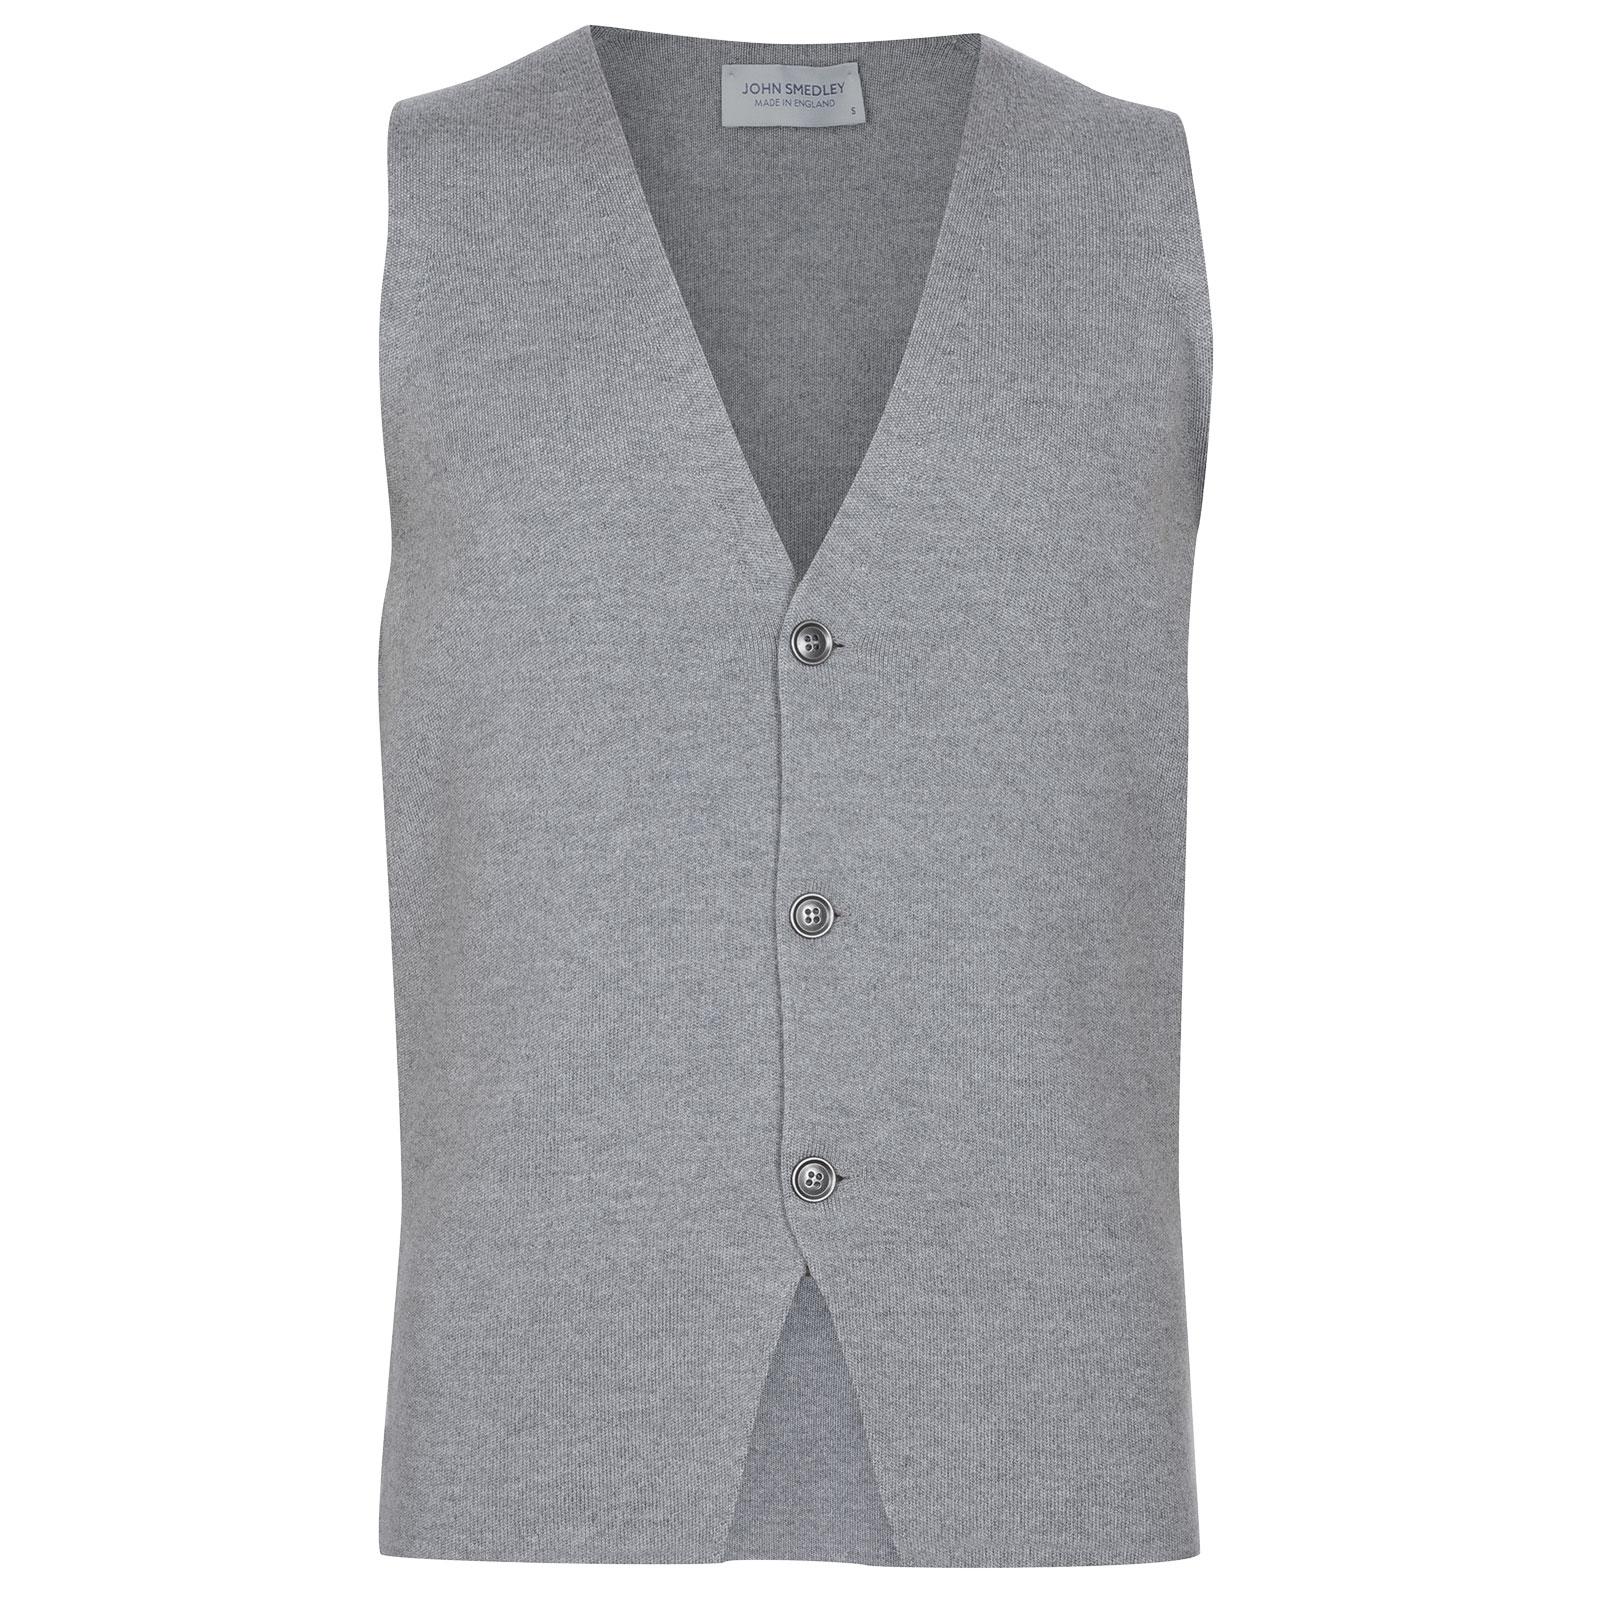 John Smedley Telford Merino Wool Waistcoat in Silver-XL